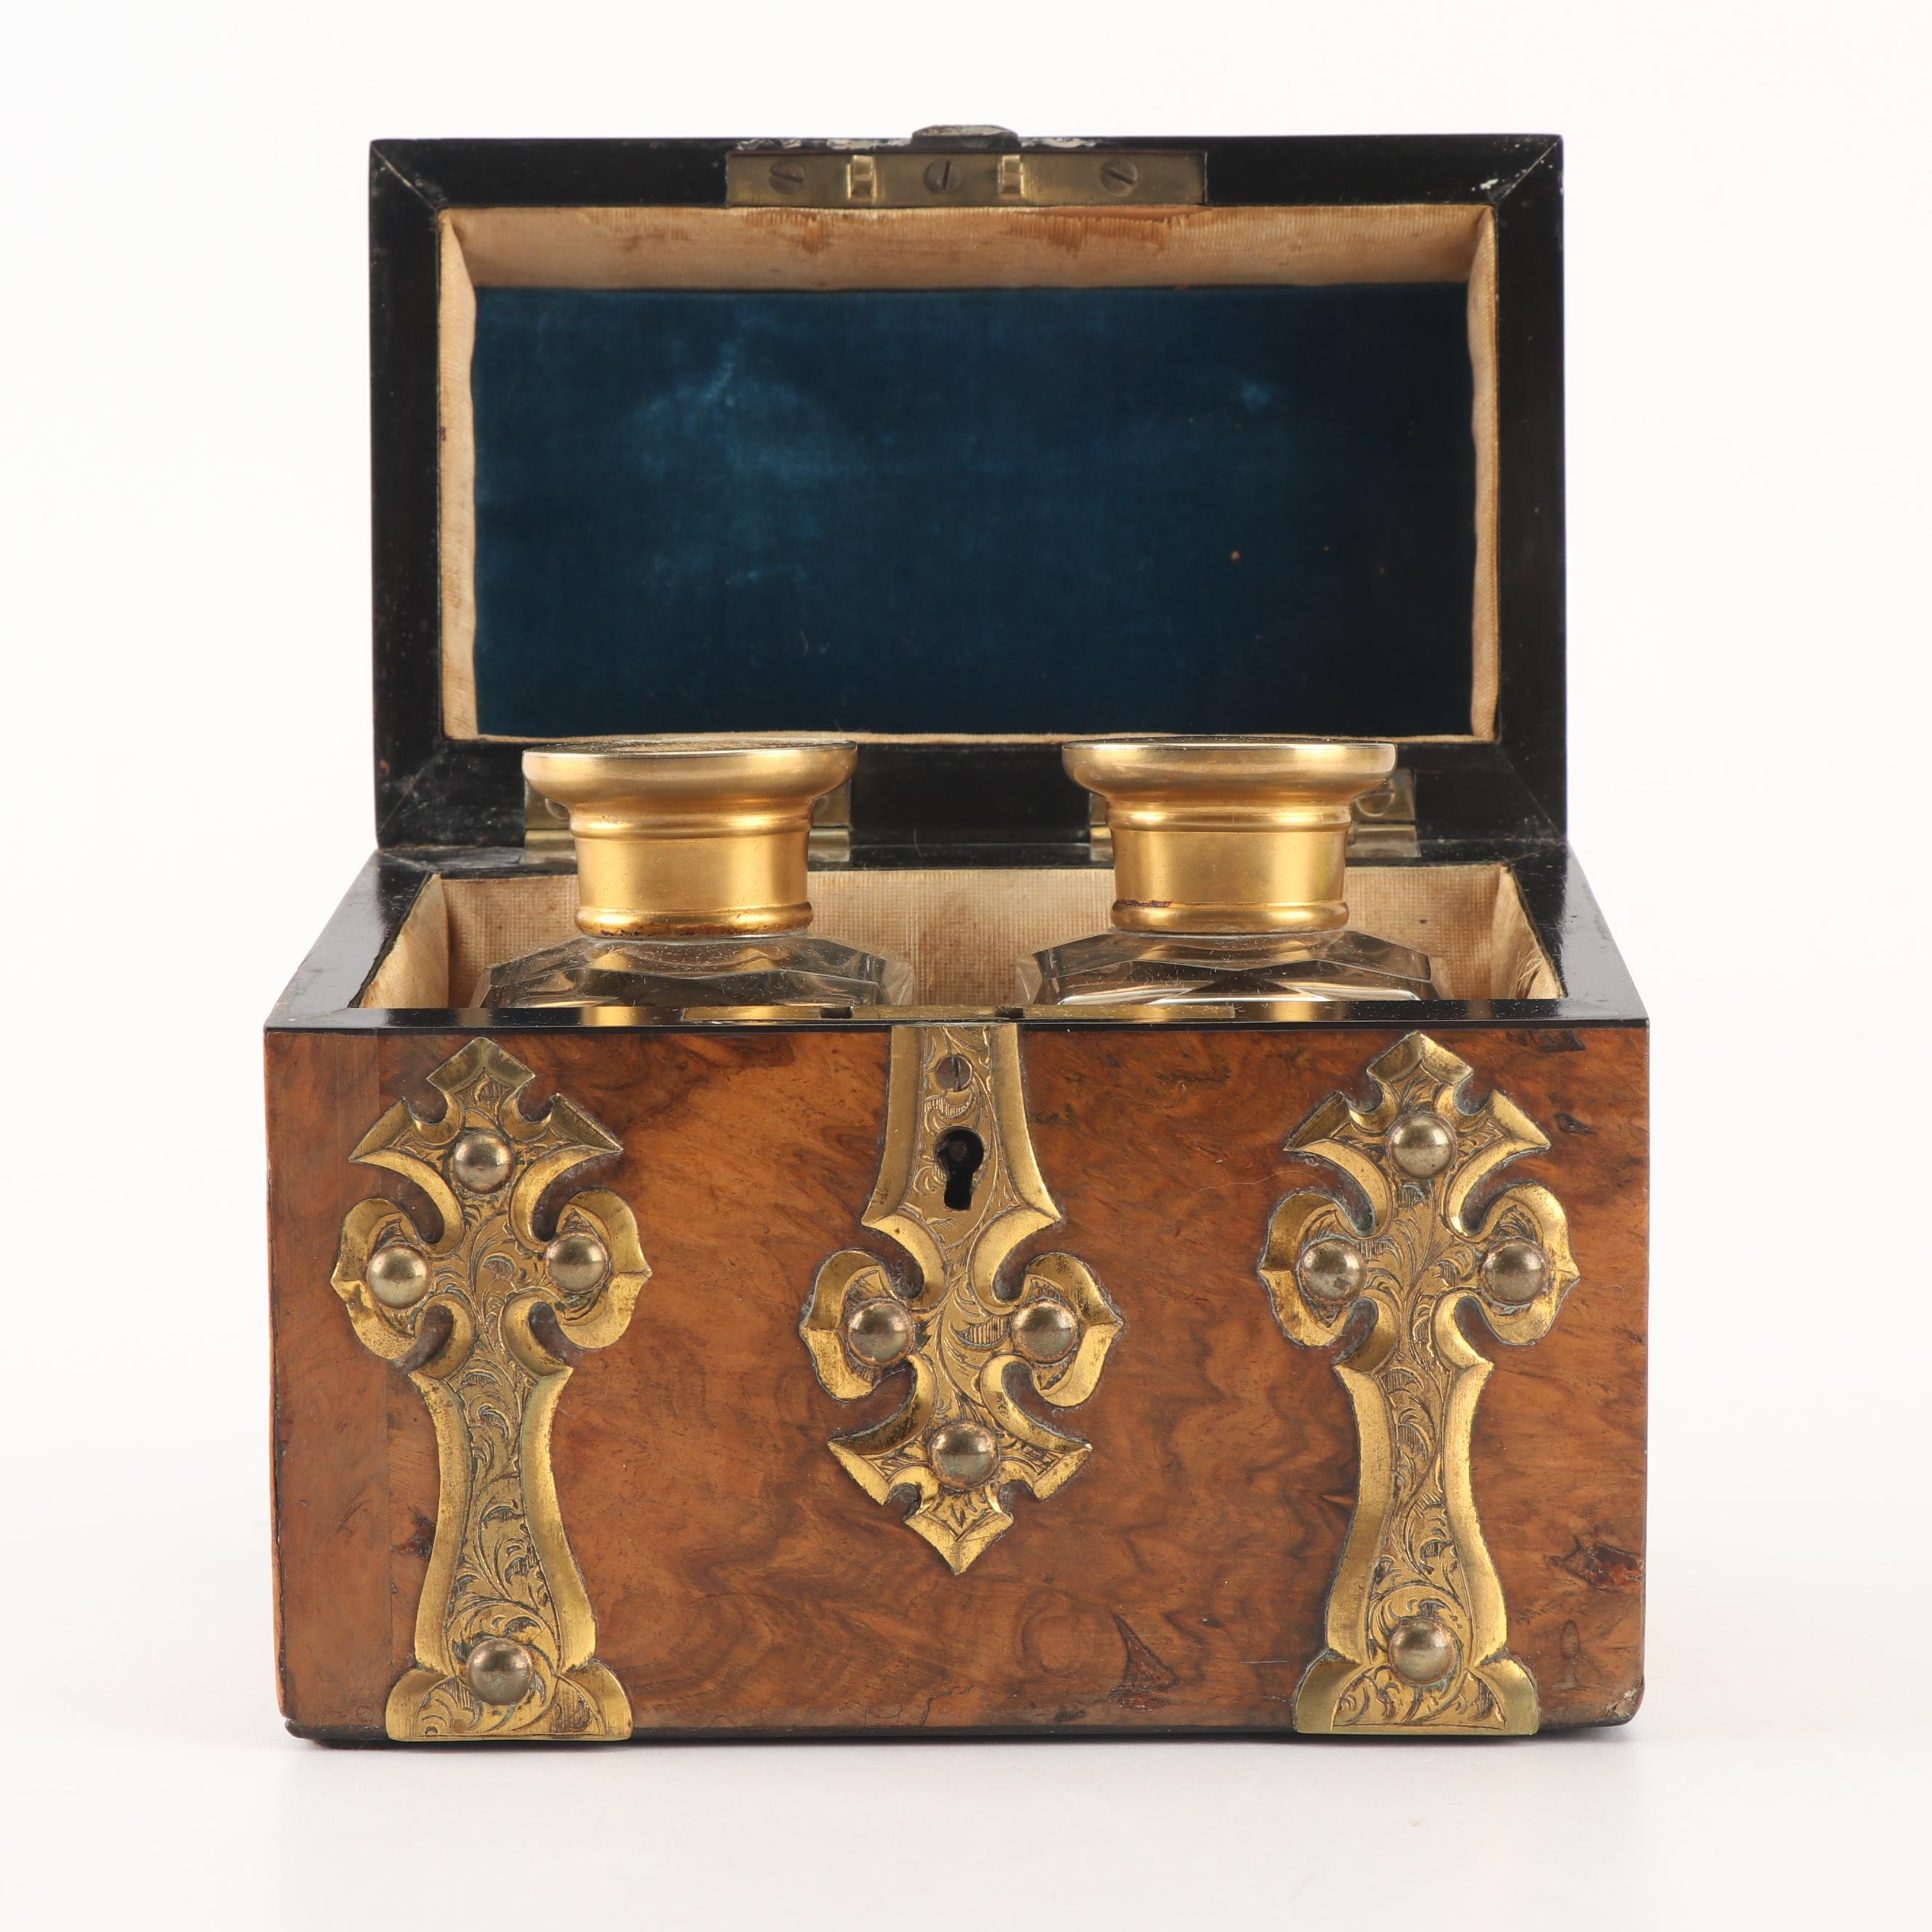 Victorian Brass-Mounted Figured Walnut Perfume Tantalus, Late 19th Century